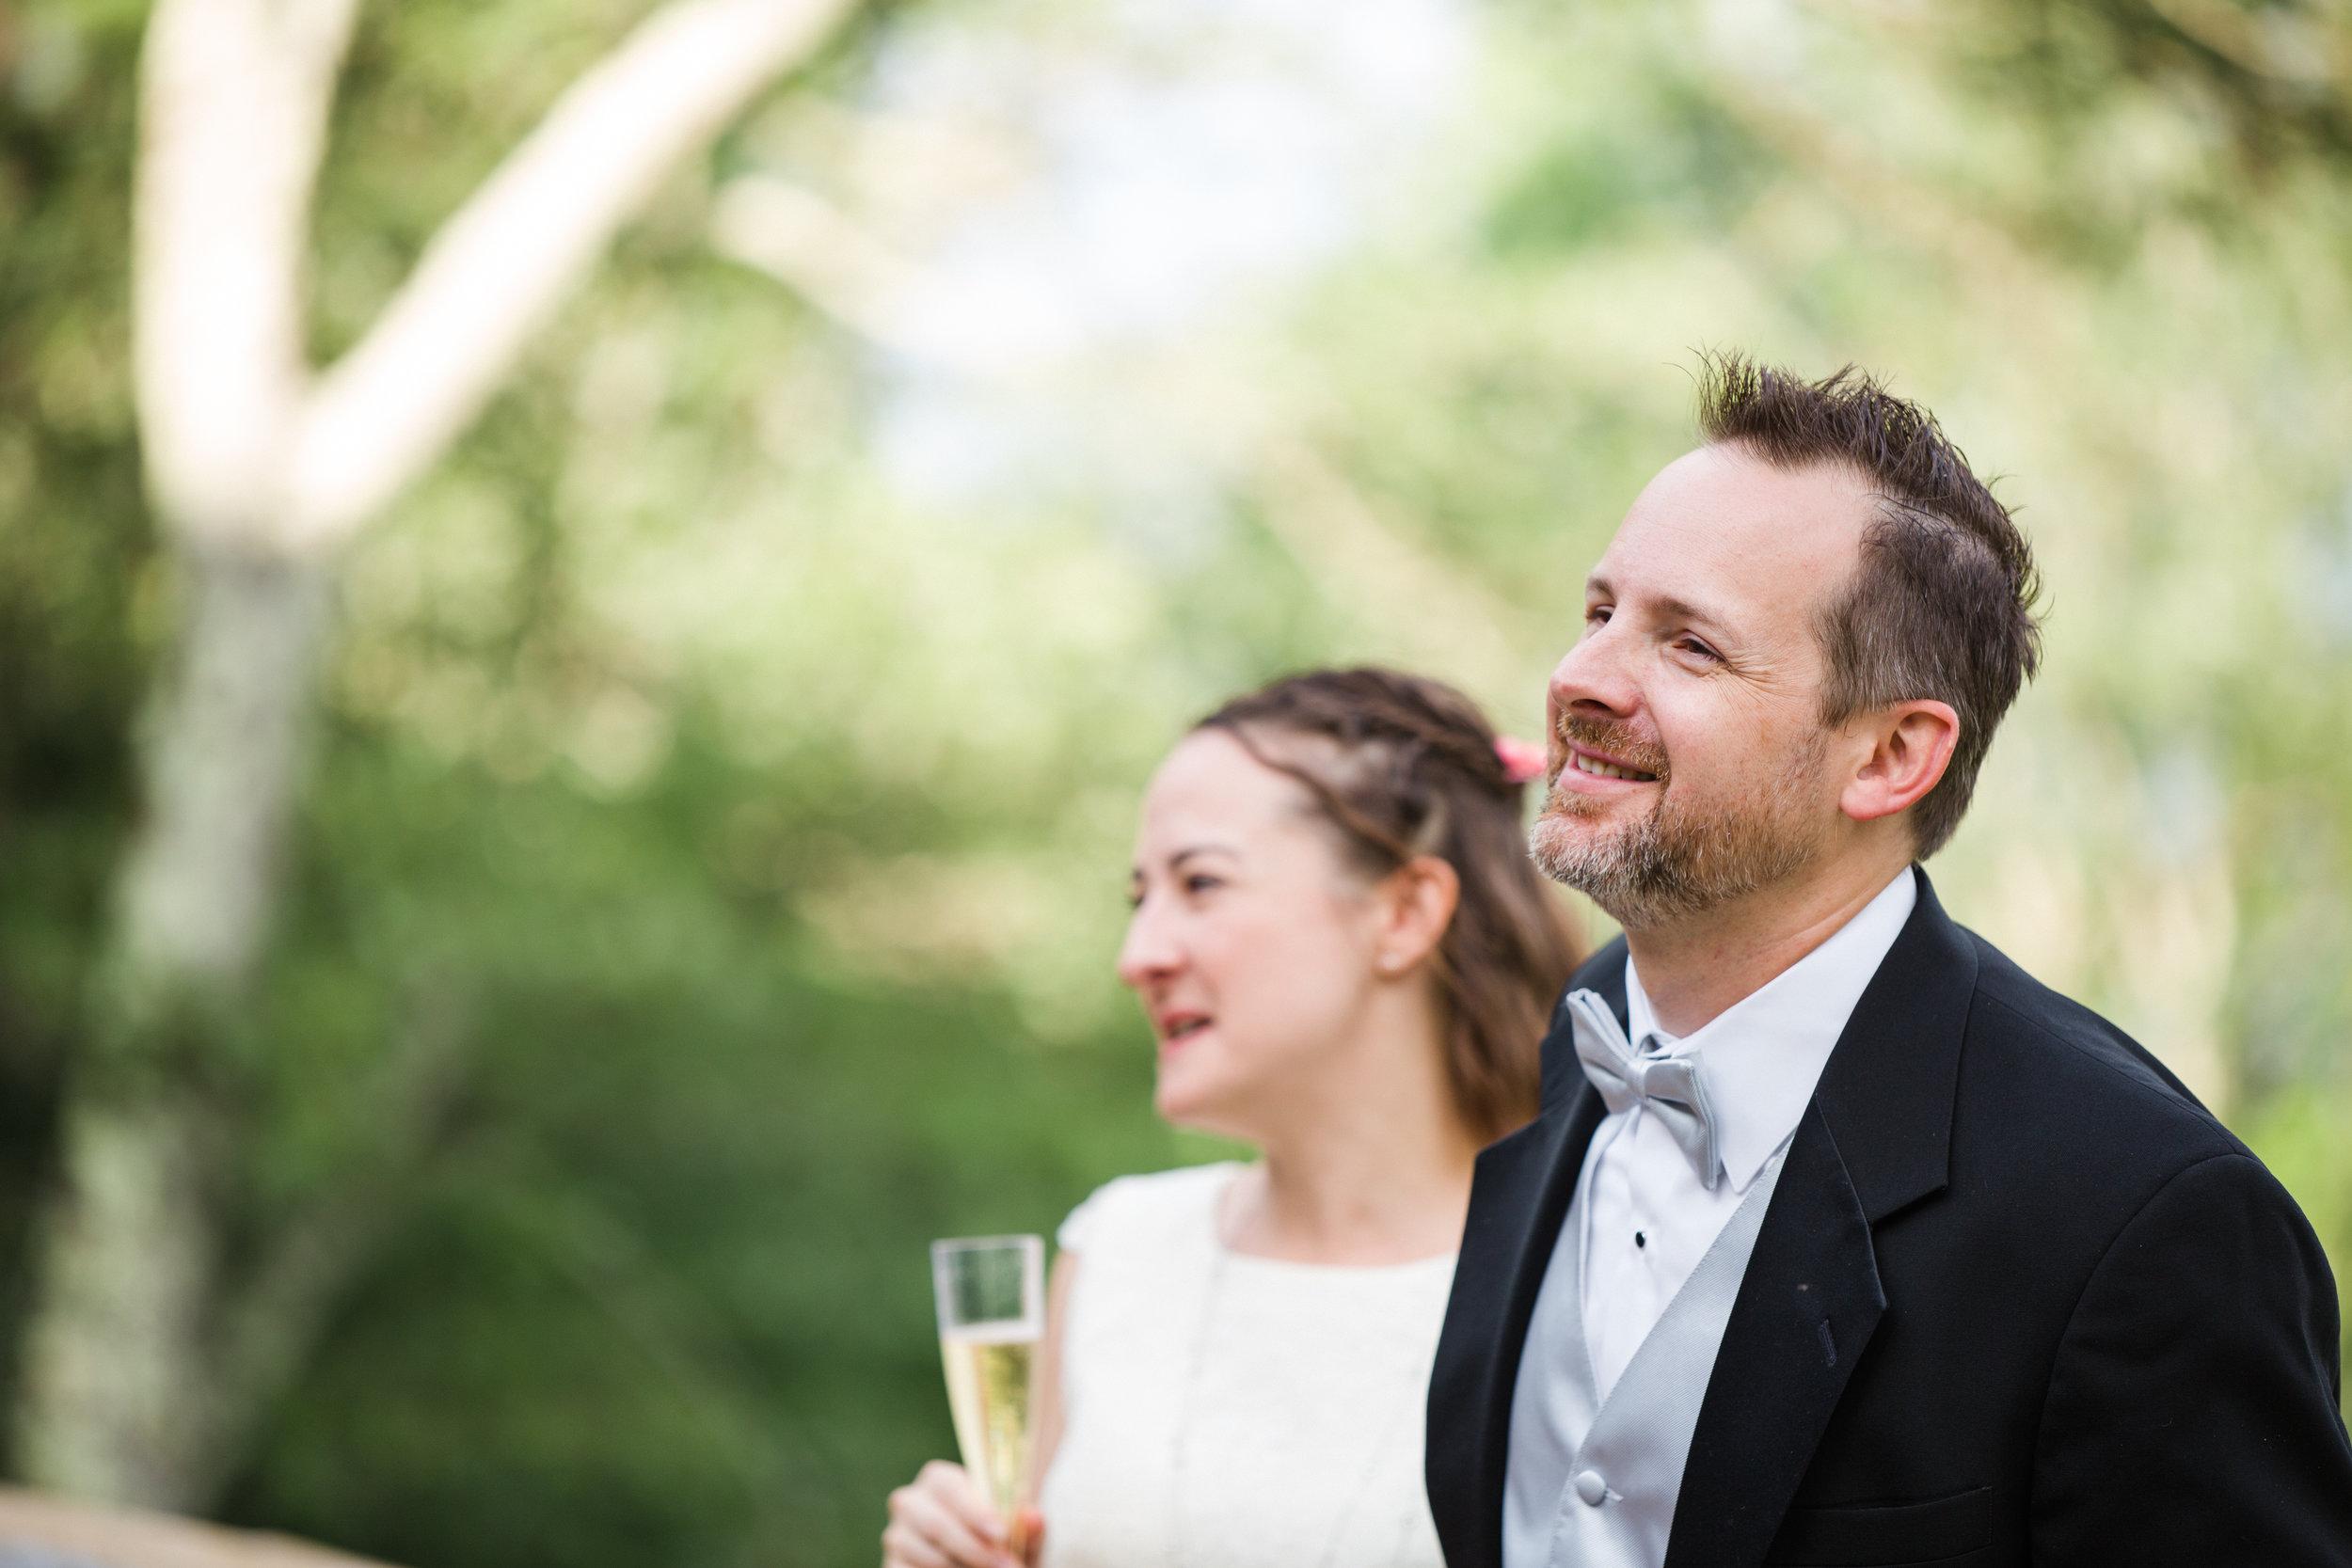 aubrey-joshua-wedding-331.jpg